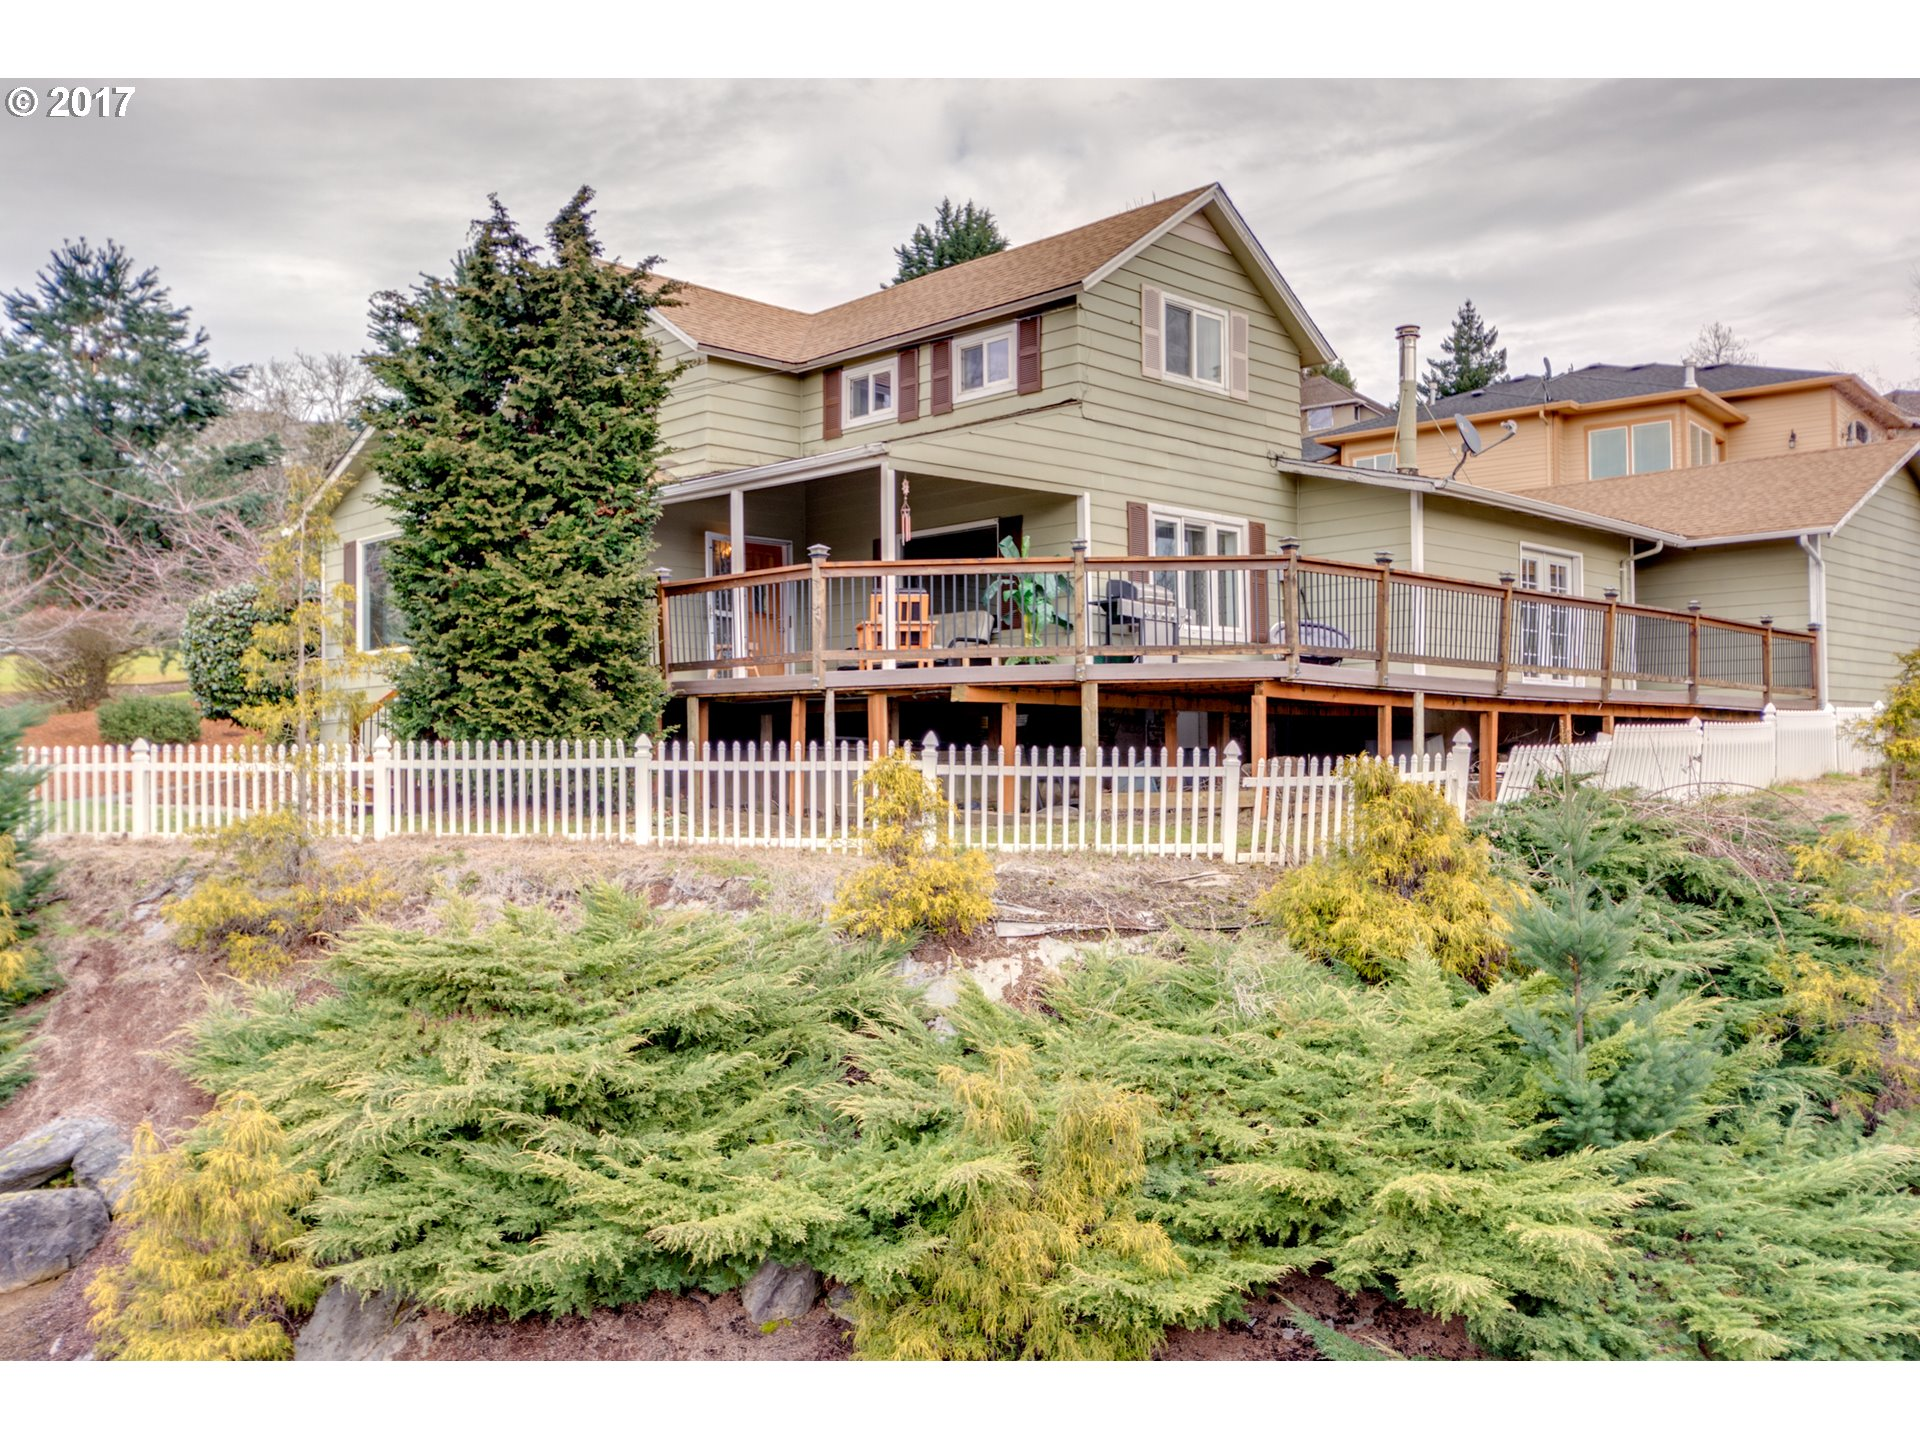 7815 NW BACON RD, Vancouver, WA 98665